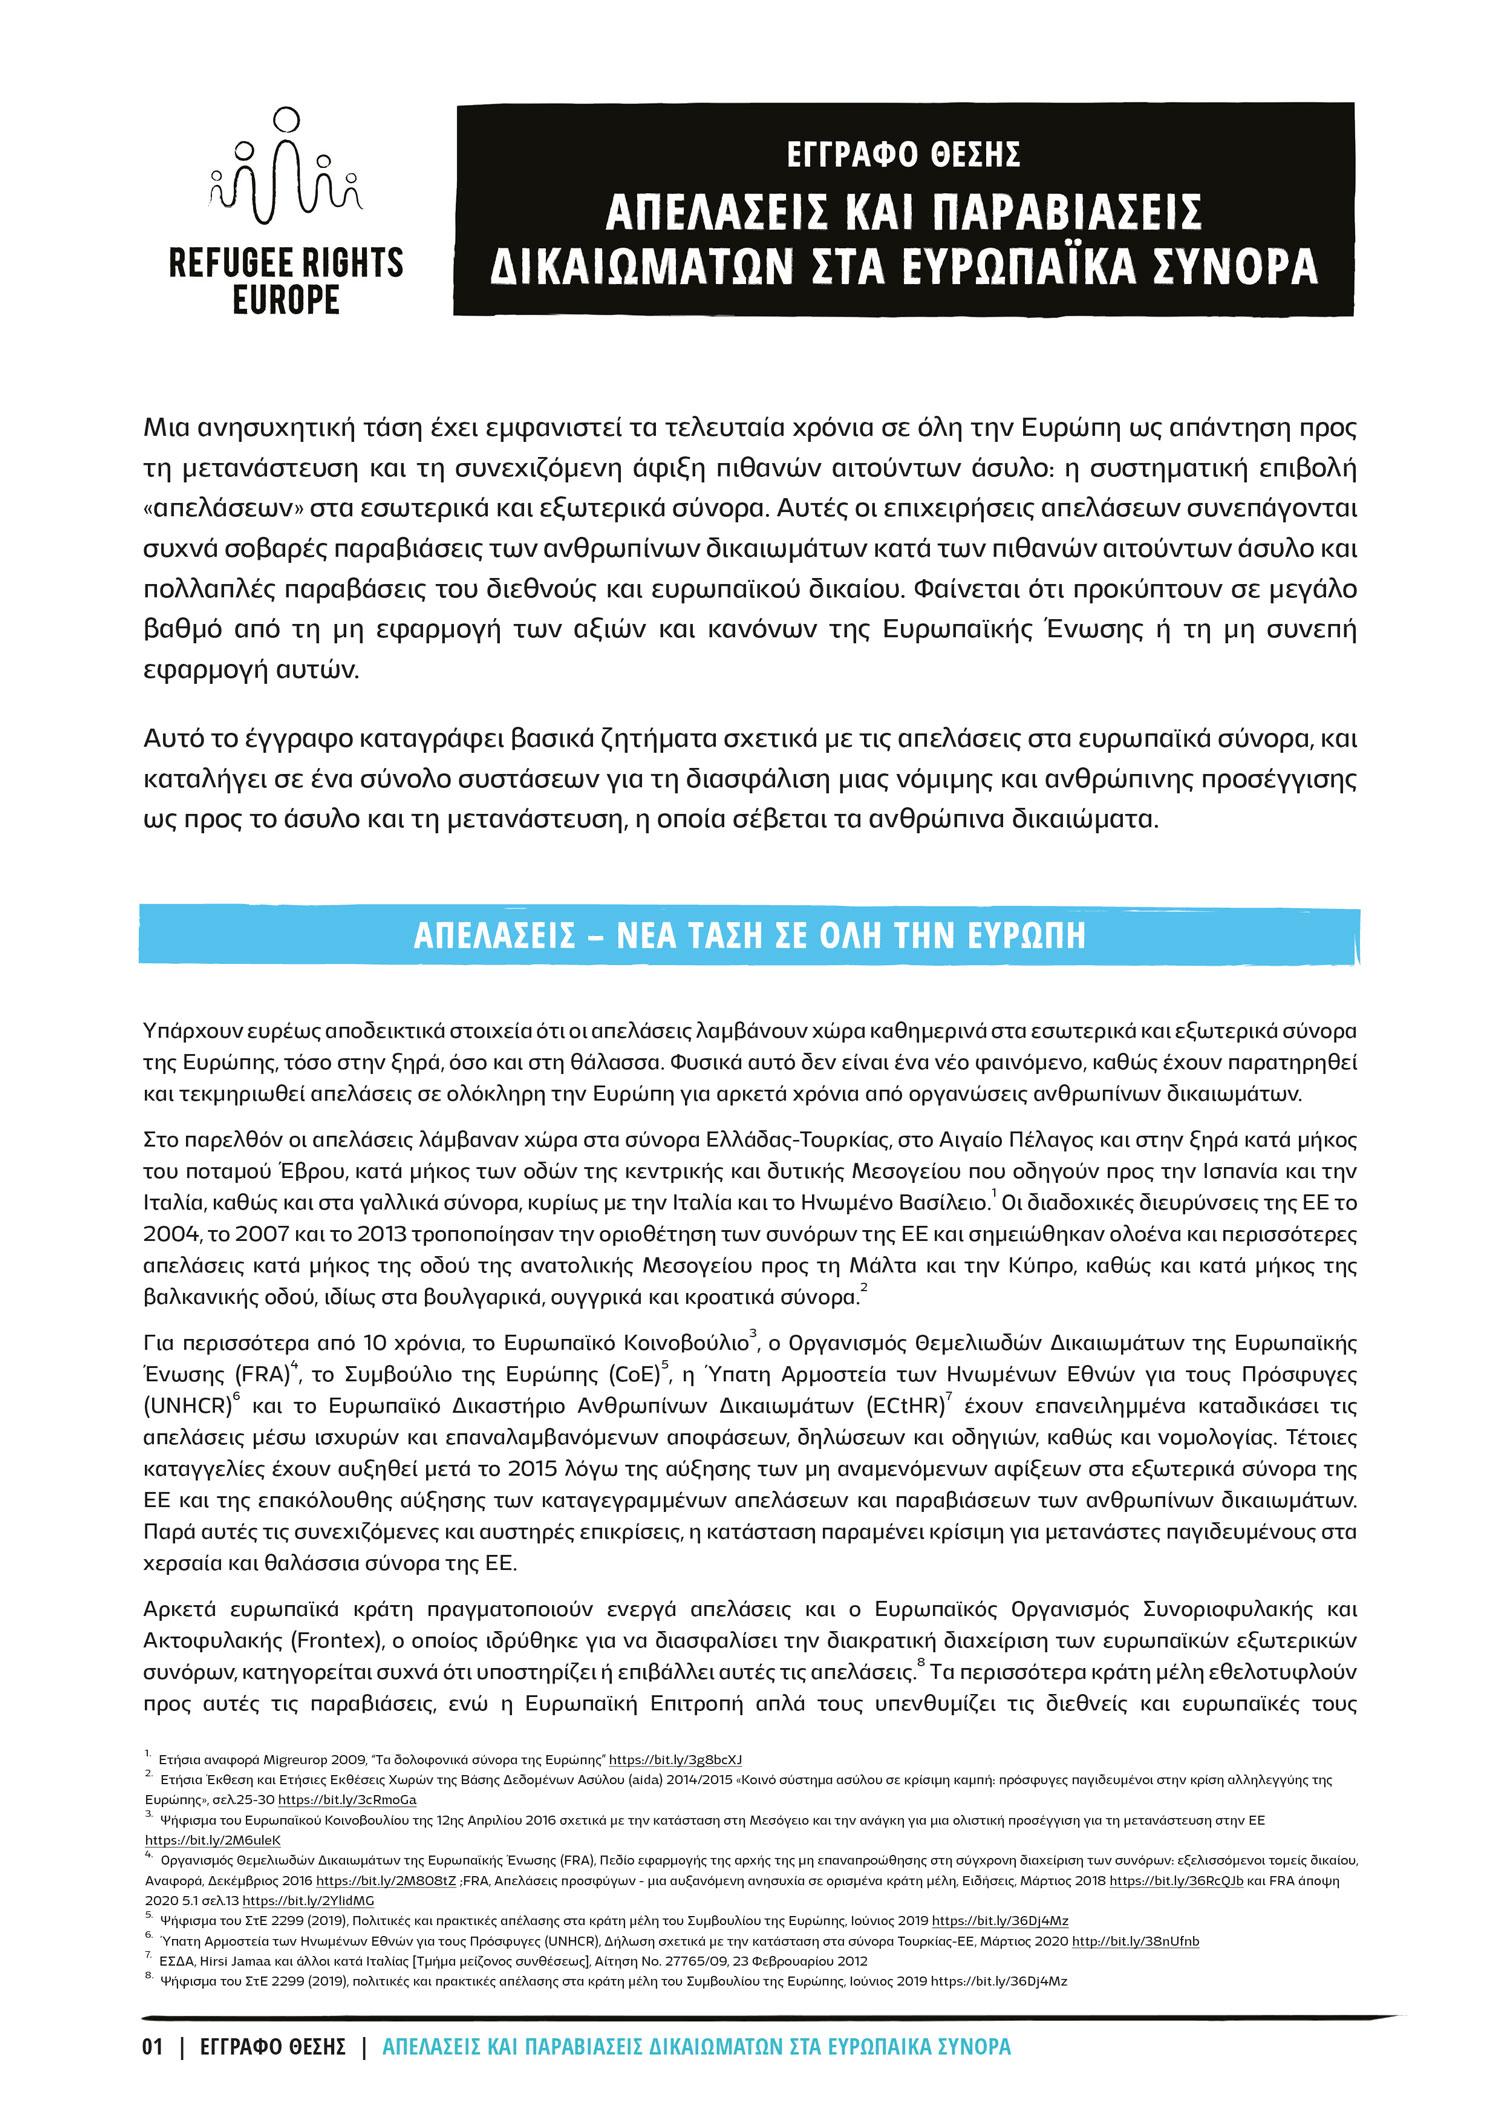 Refugee Rights Europe Απελaσεις_Ελληνικa Position Paper